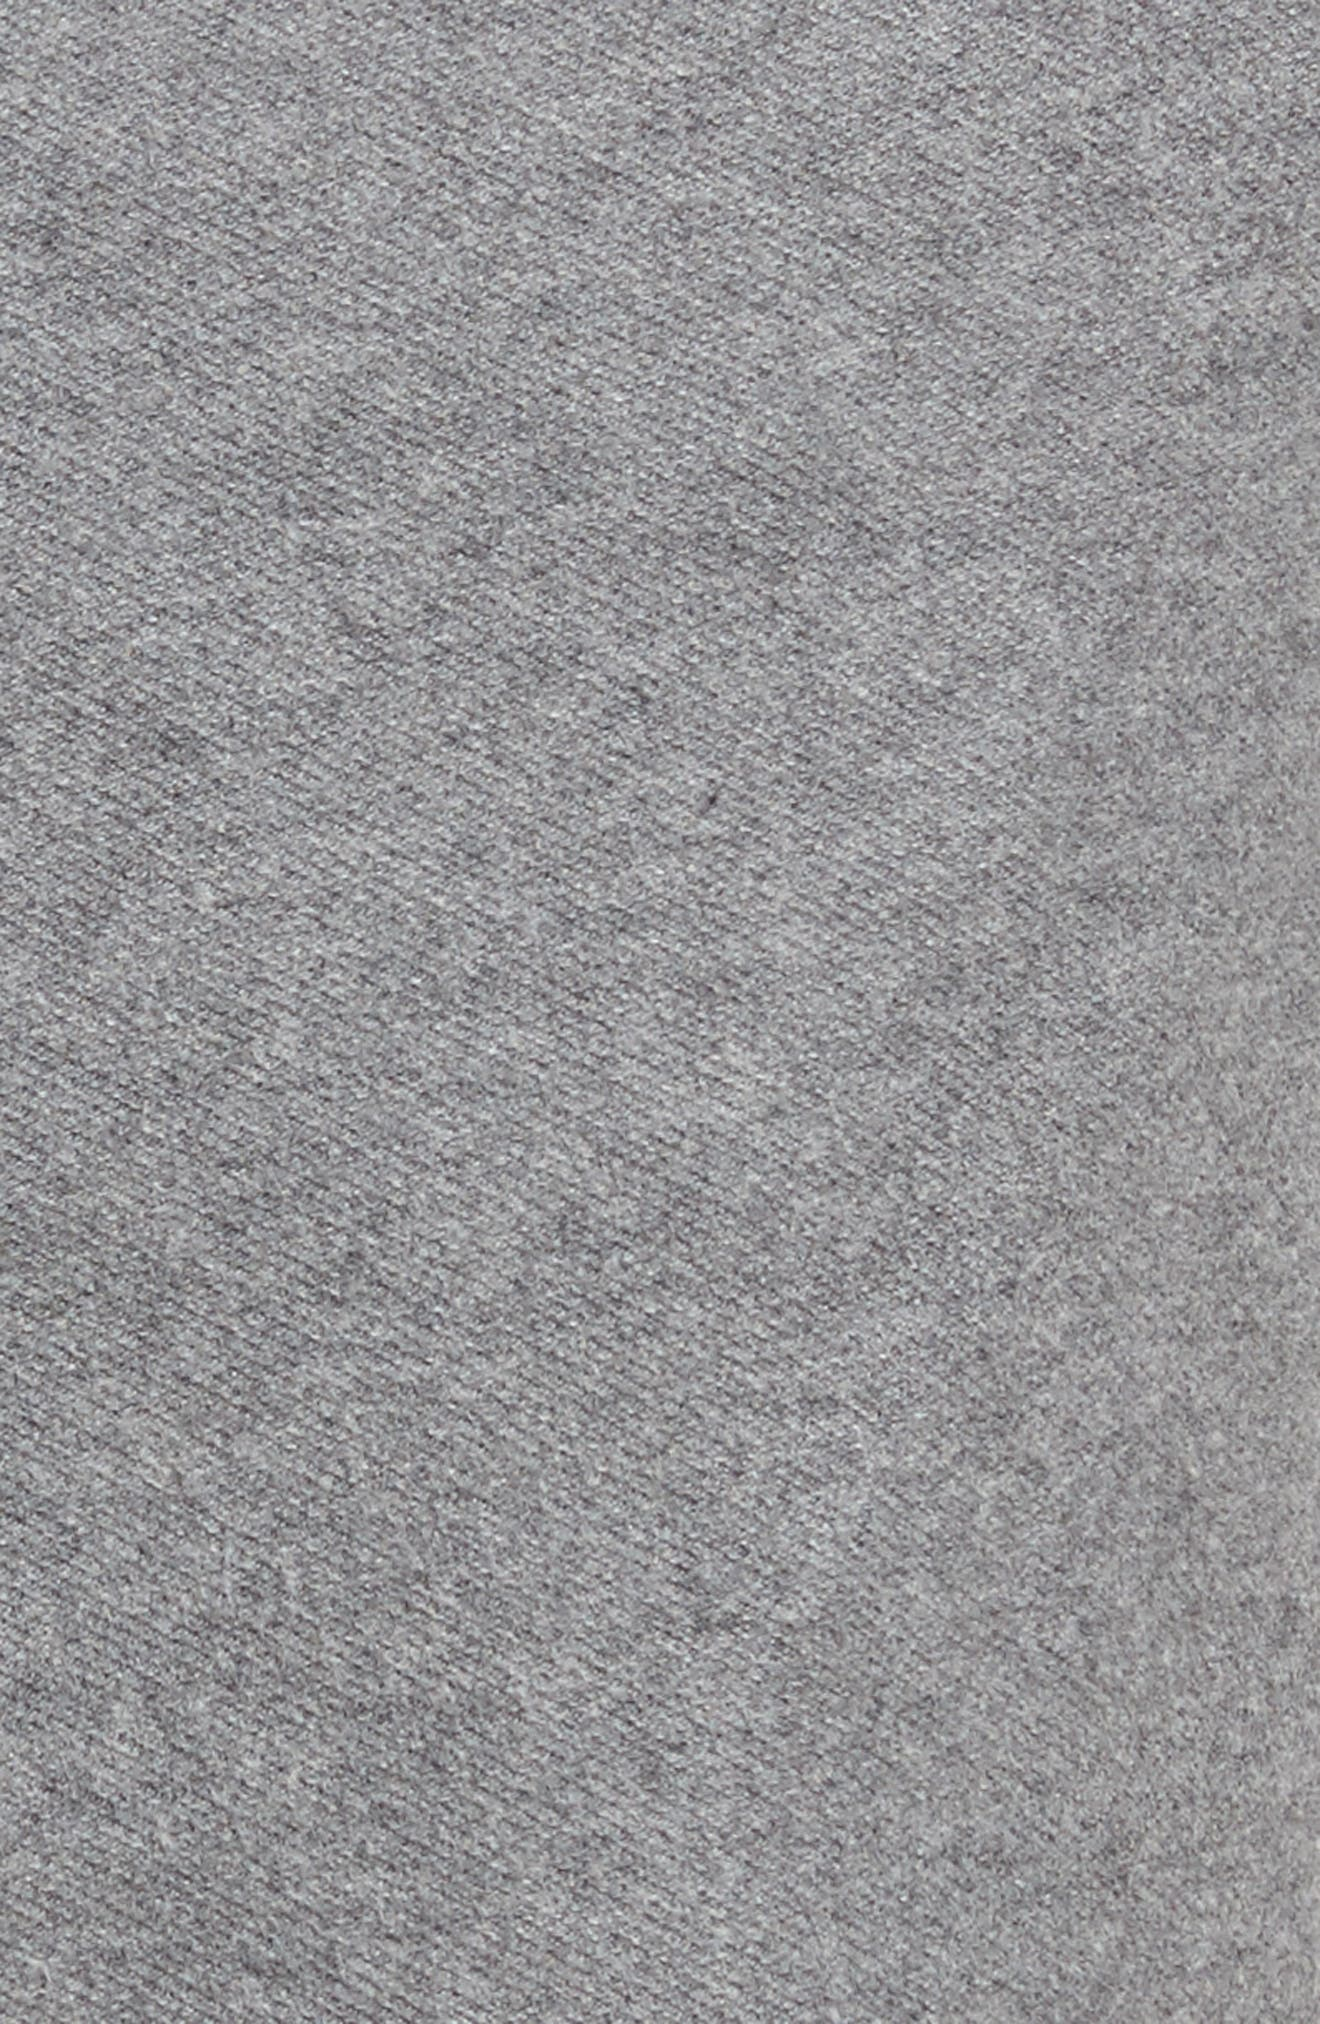 Heathered Knit Lounge Pants,                             Alternate thumbnail 5, color,                             086